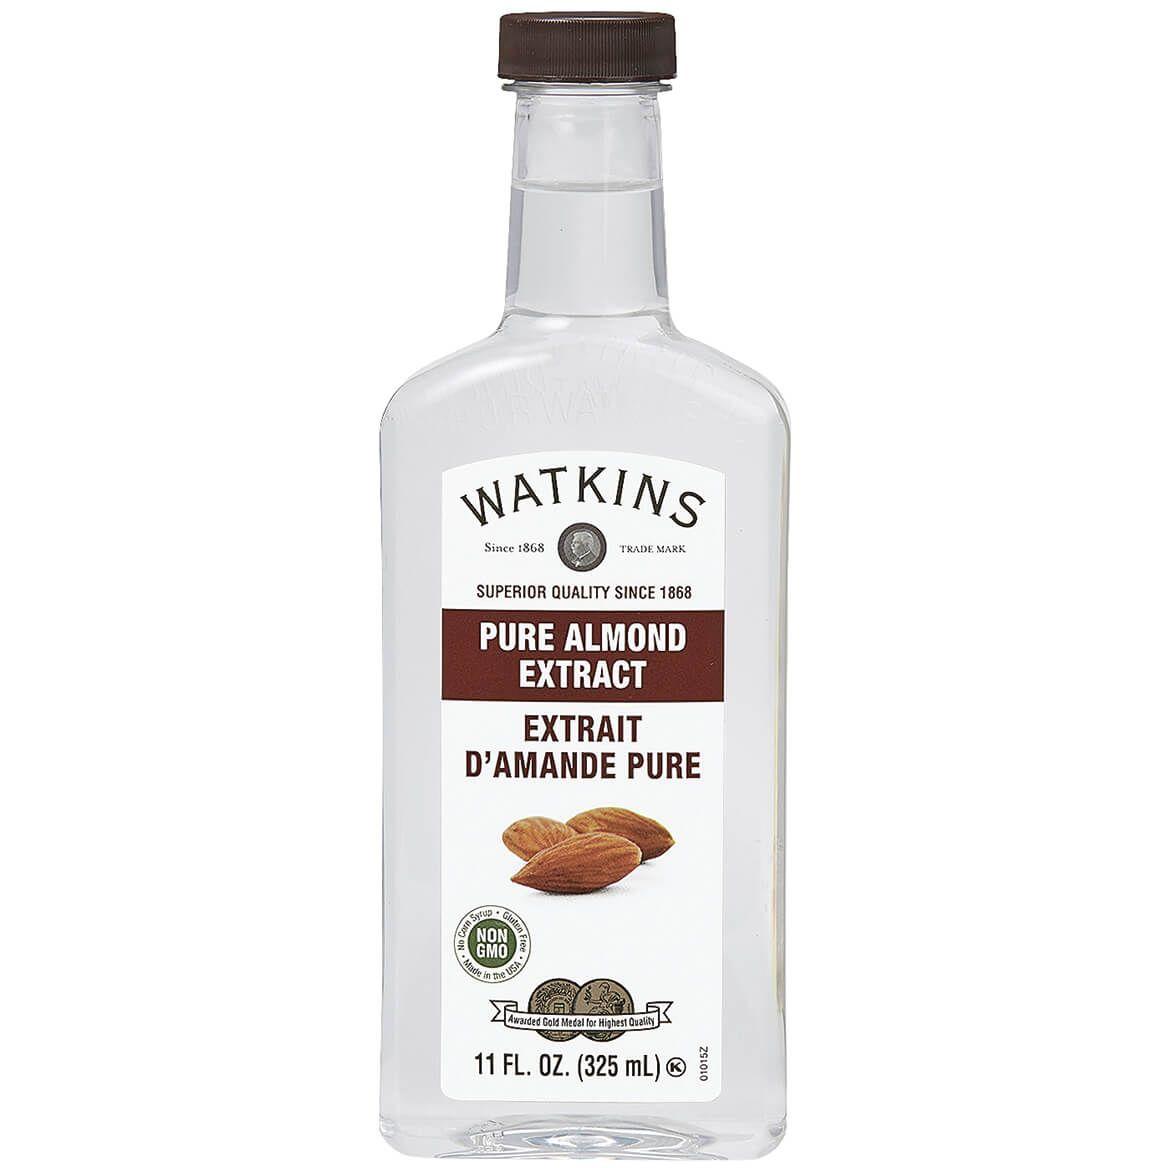 Watkins 11 oz Almond Extract-368471